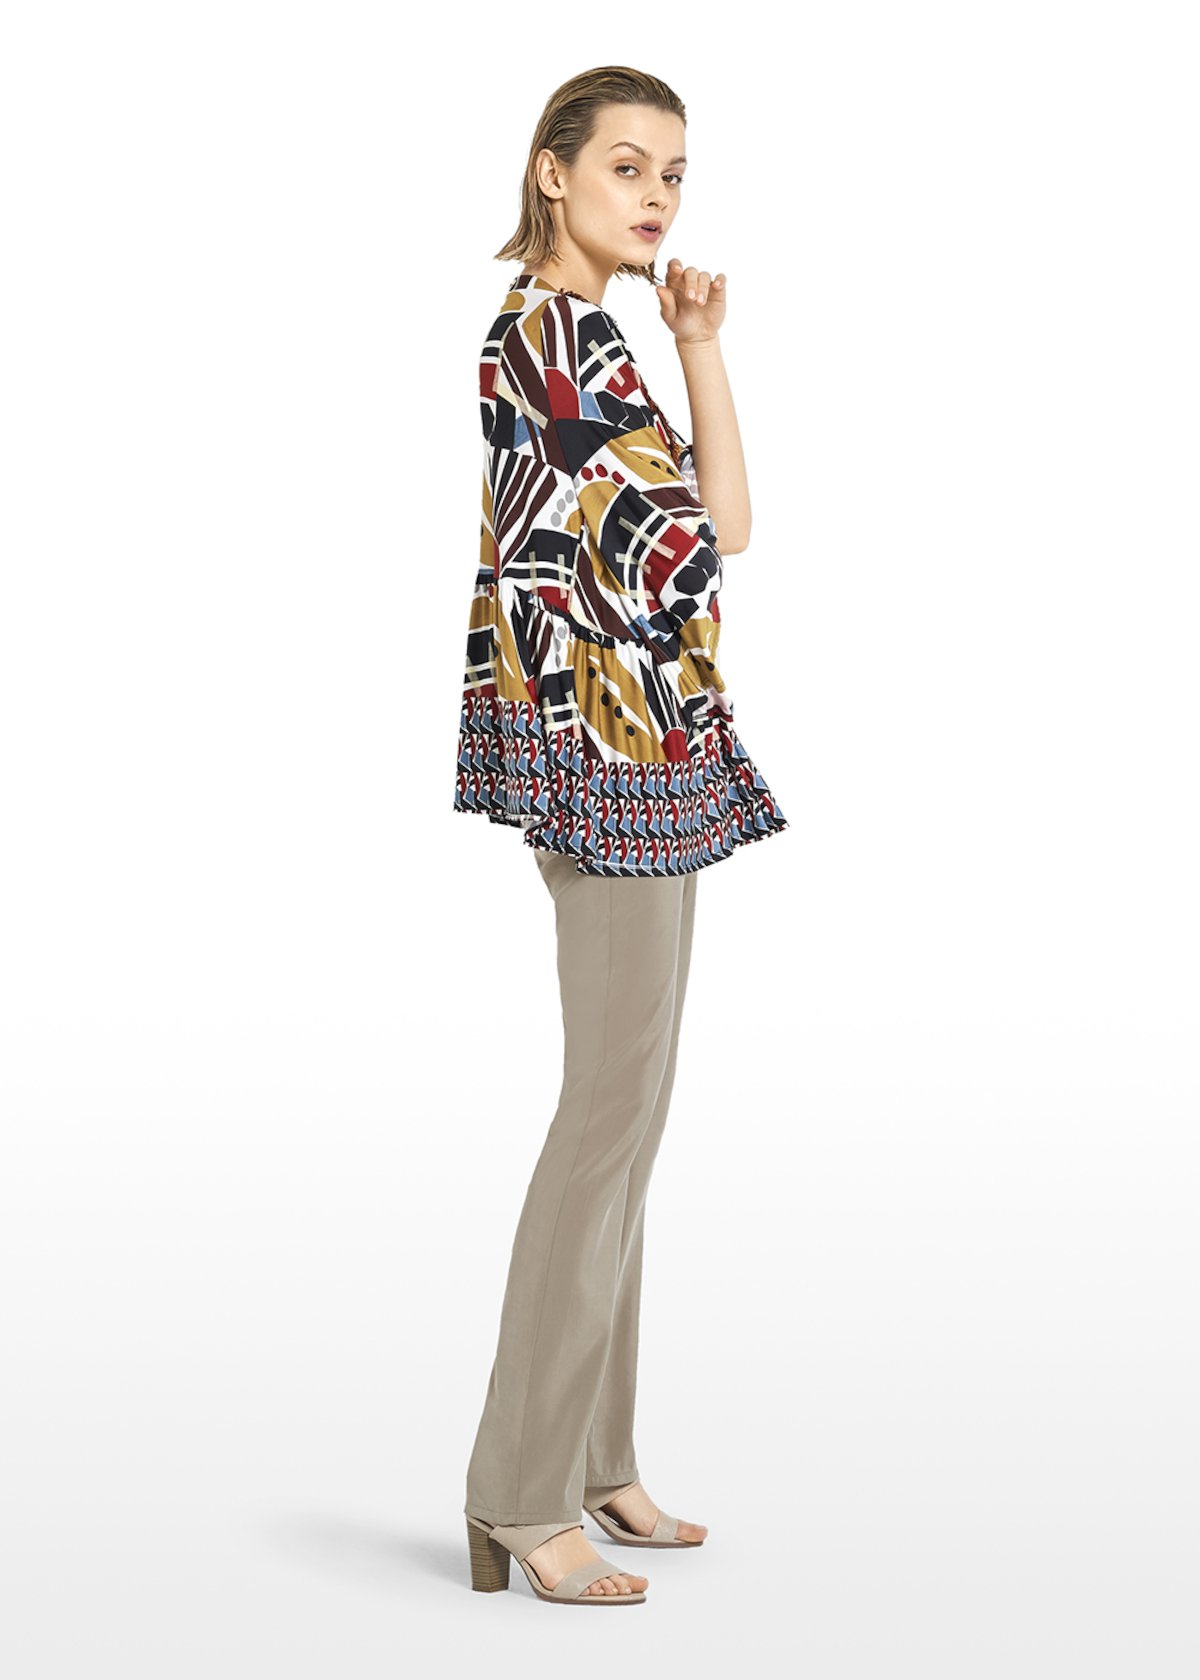 T-shirt Sissie ethno pattern with V-neck - Kiwi / Black Fantasia - Woman